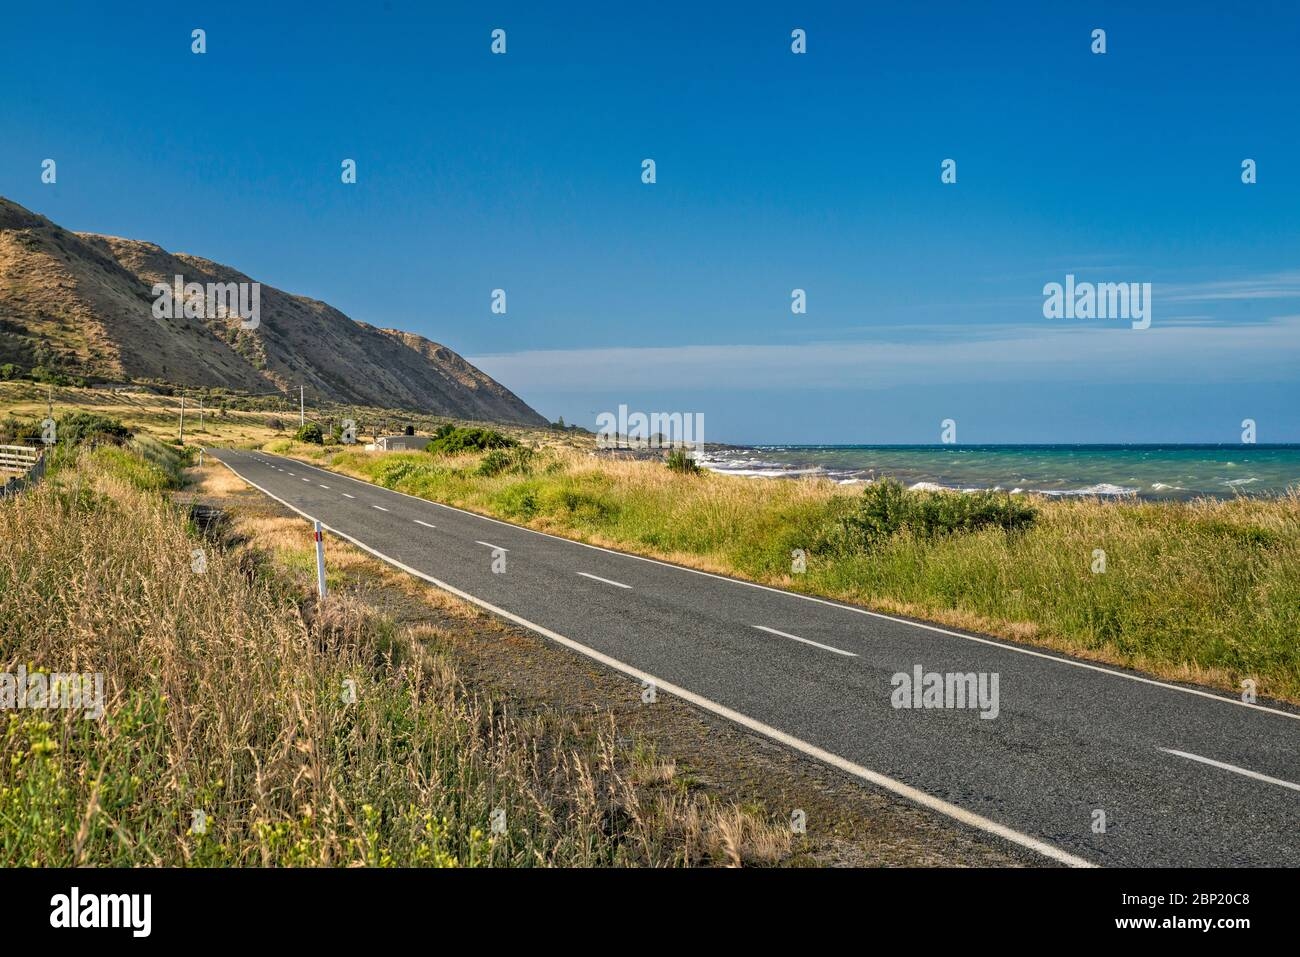 Cape Palliser Road near Te Humenga Point, South Wairarapa Coast, Palliser Bay, Cook Strait, Wellington Region, North Island, New Zealand Stock Photo